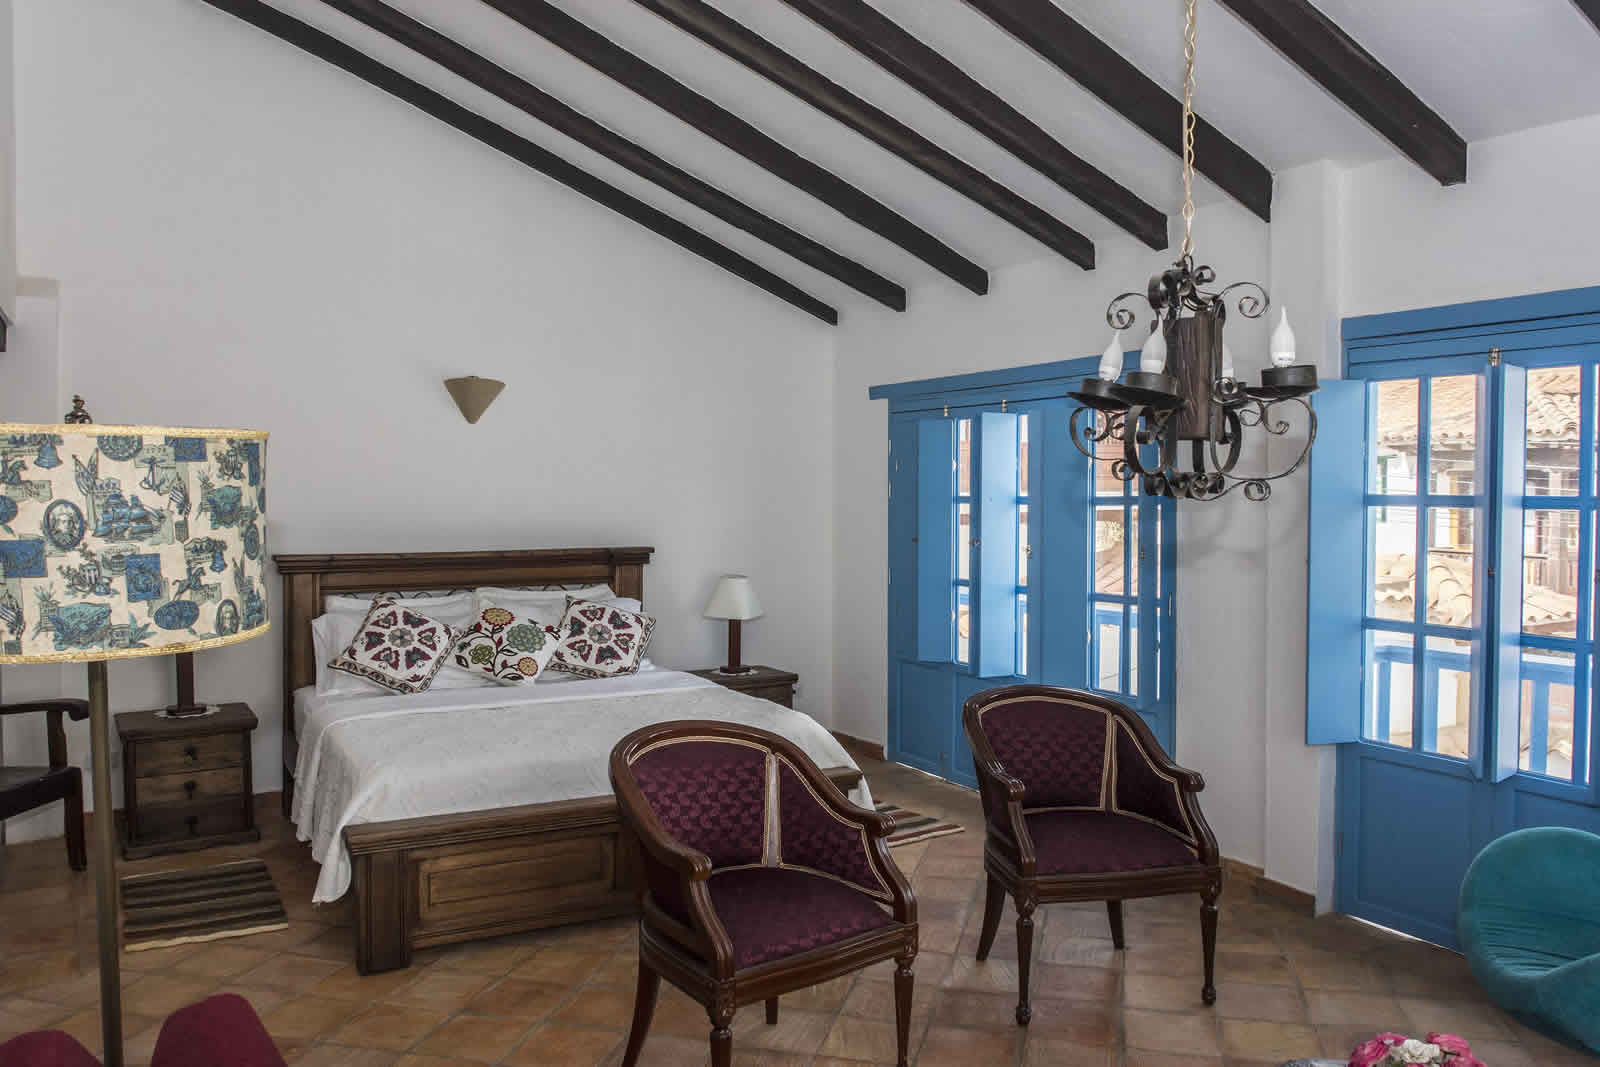 Alquiler Casa Azul en Villa de Leyva habitación principal